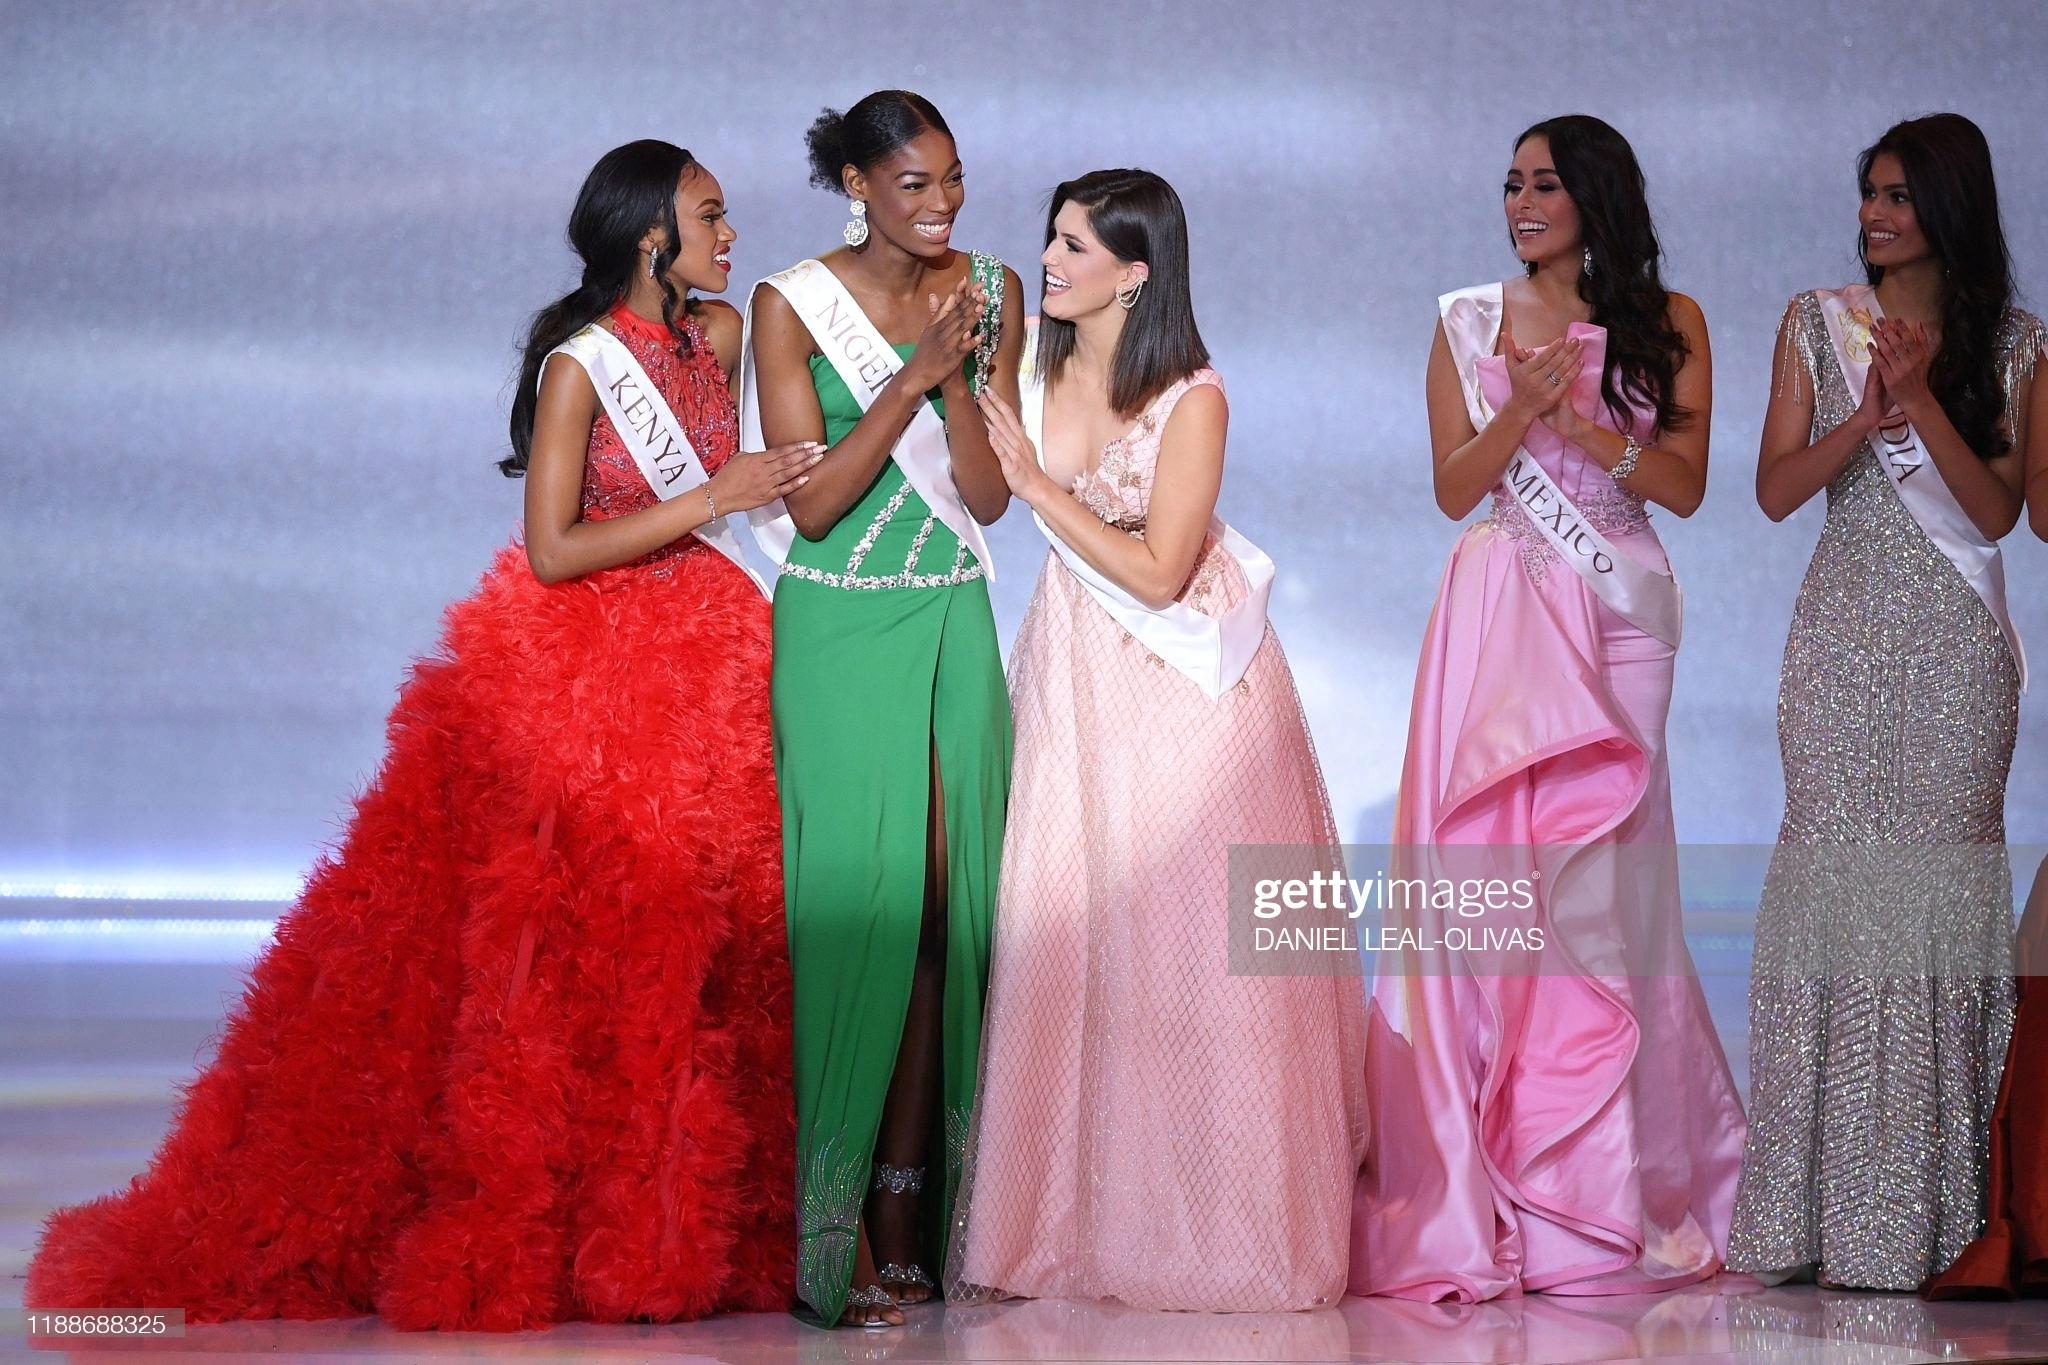 elis miele, top 5 de miss world 2019. - Página 41 Pae8e10